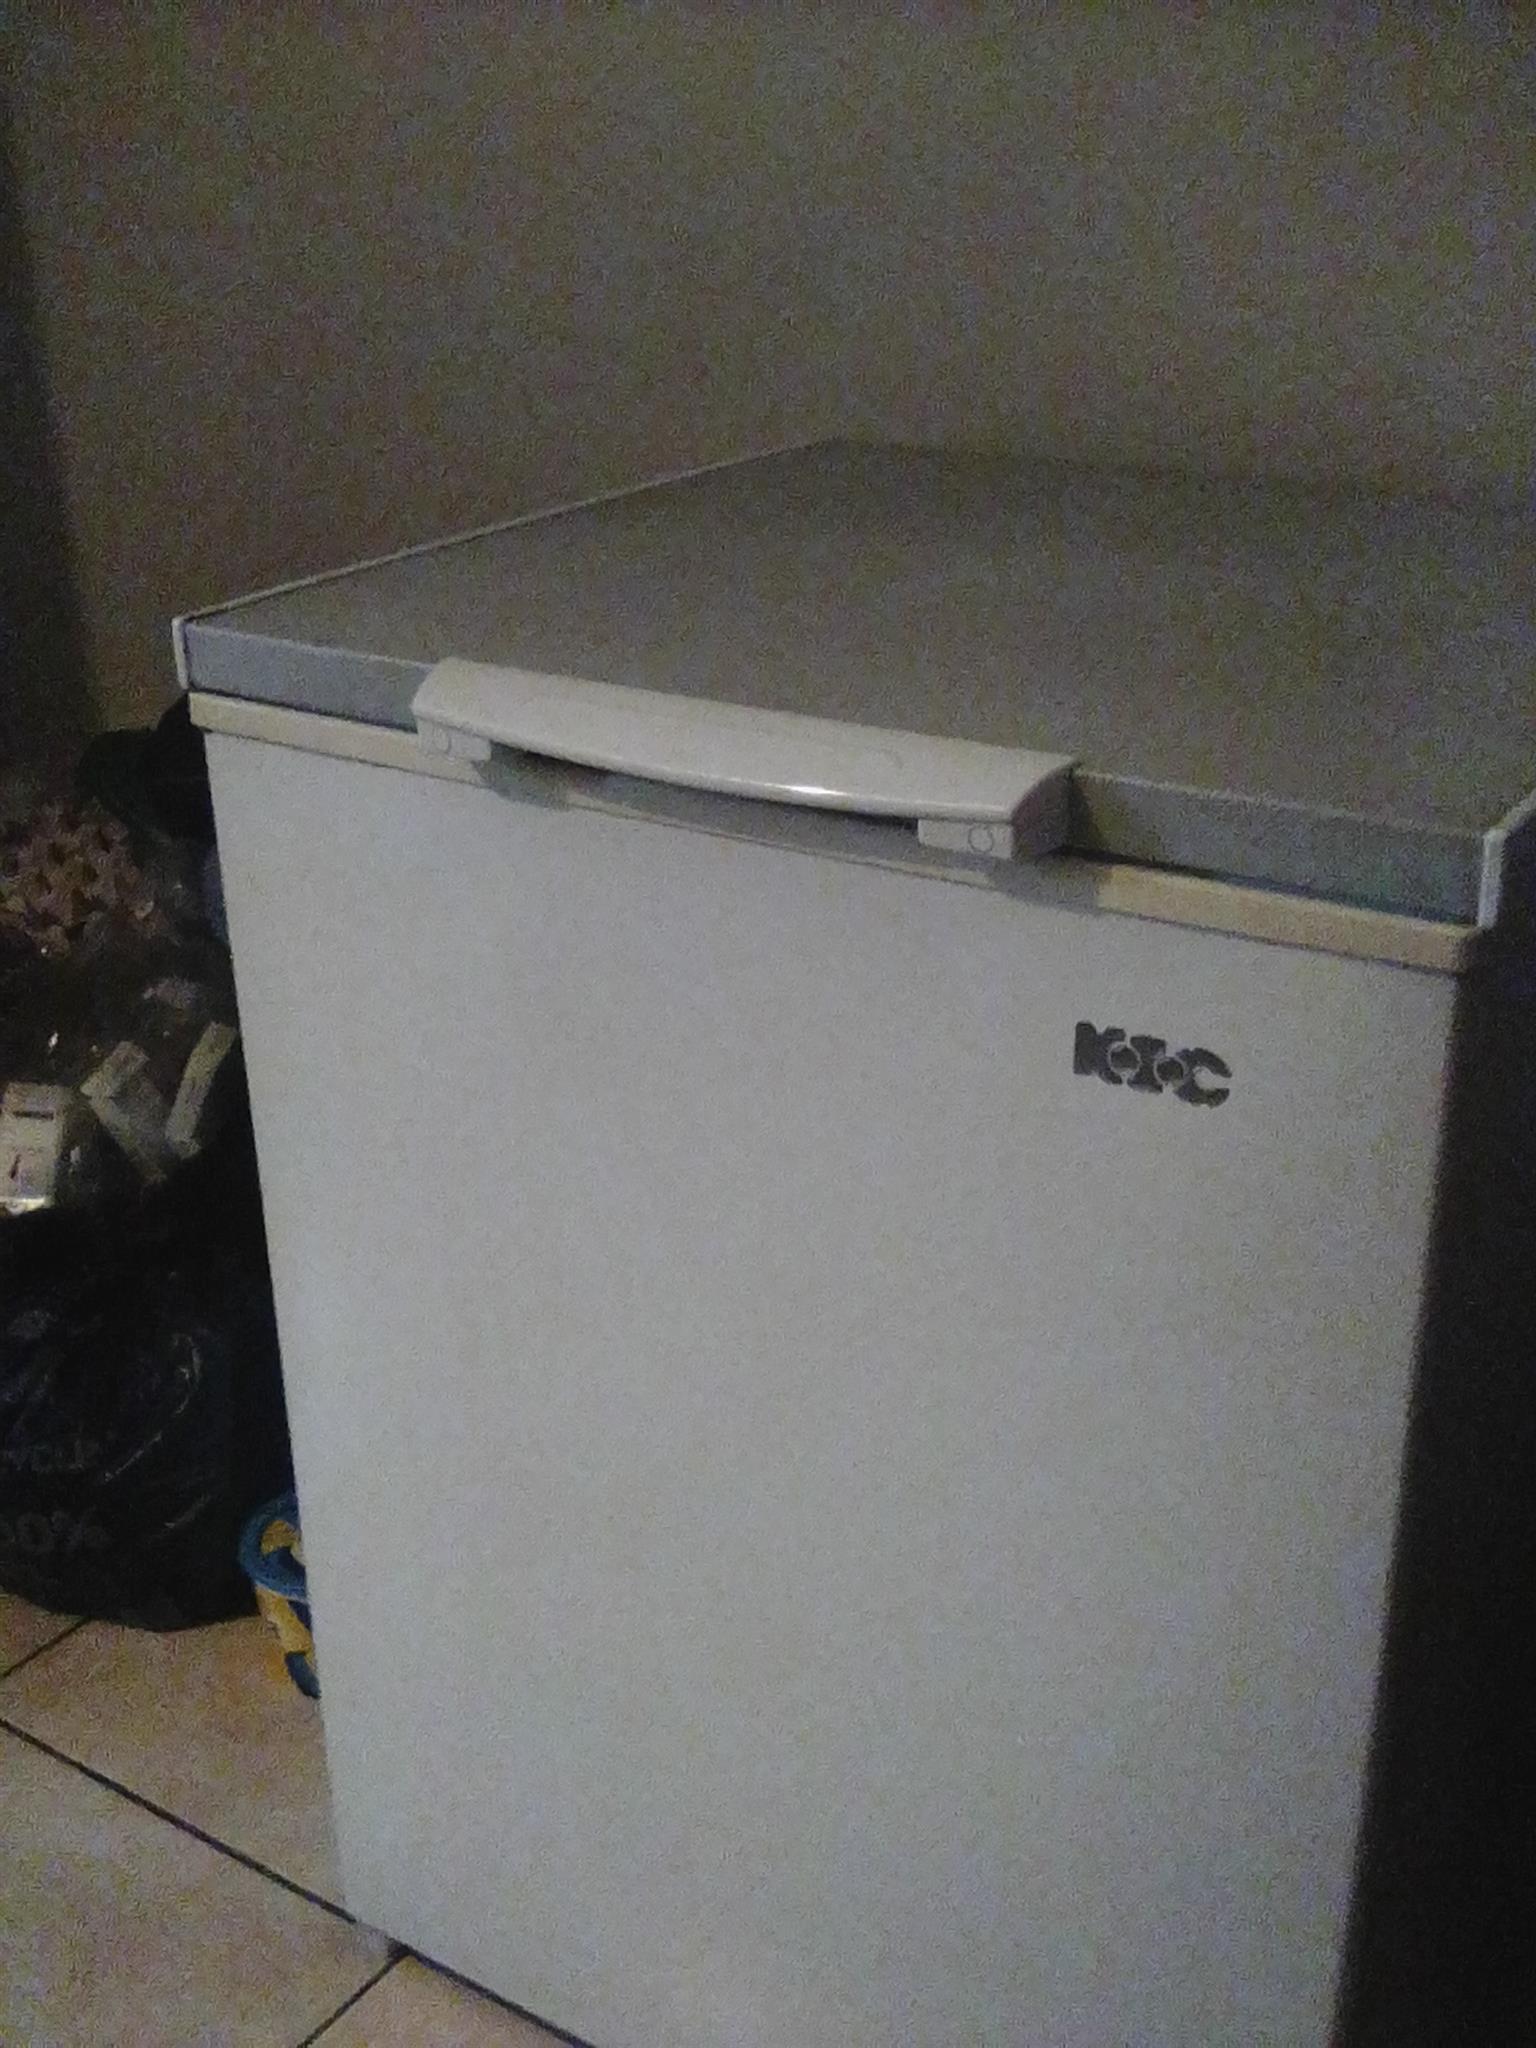 KIC deep freezer